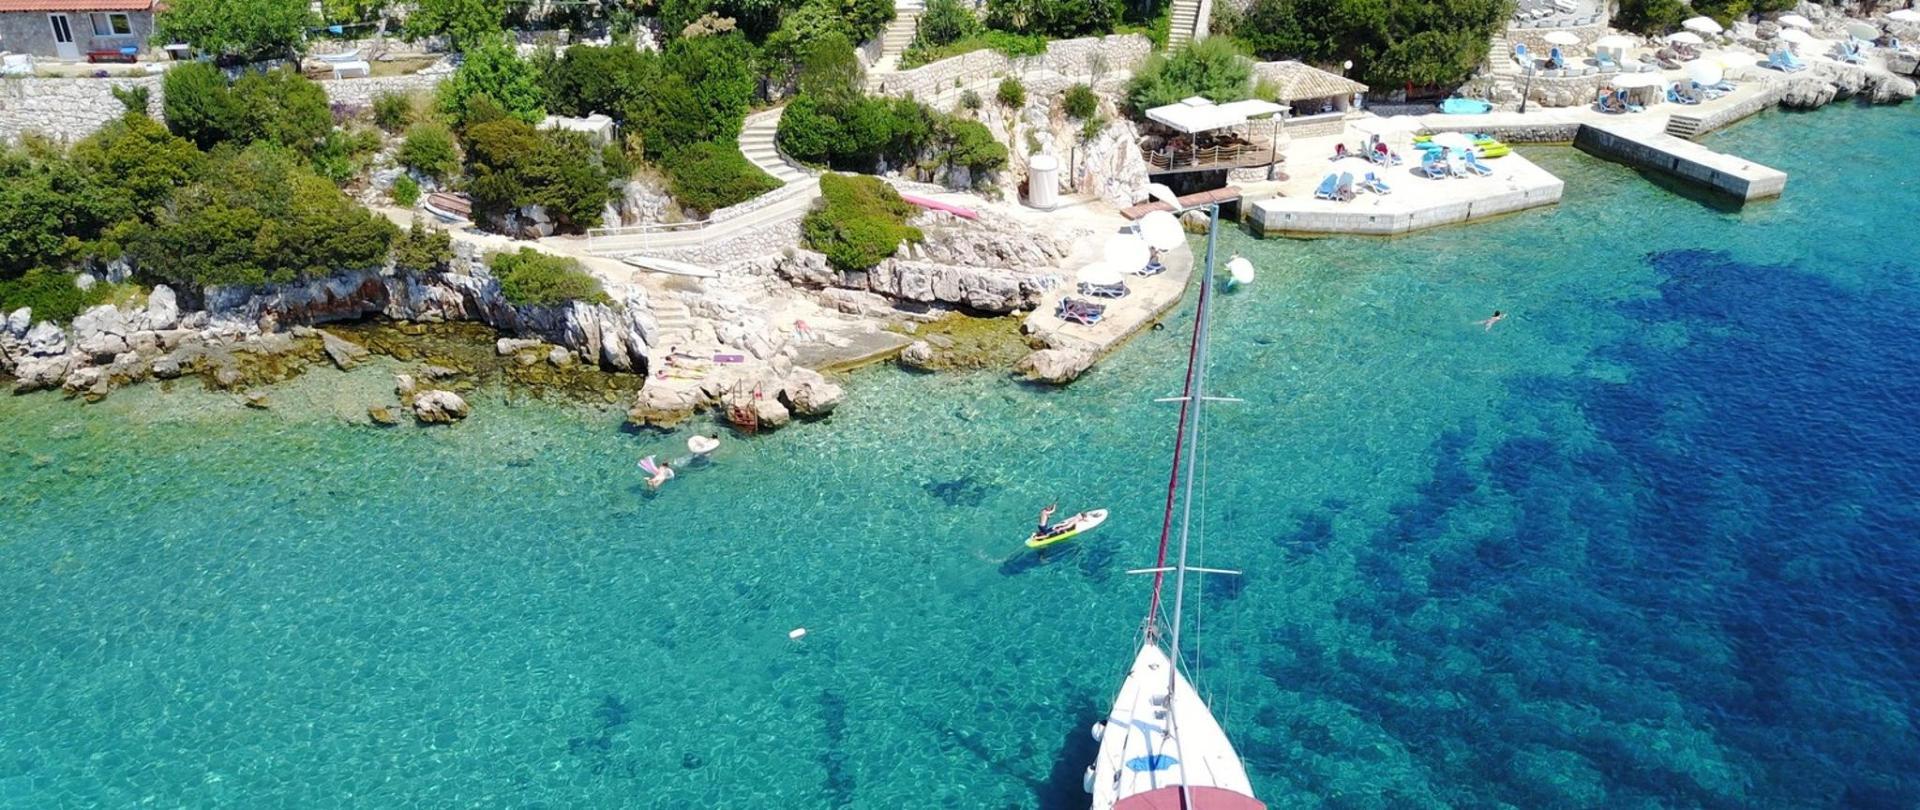 Hotel Bozica Dubrovnik Islands.jpg